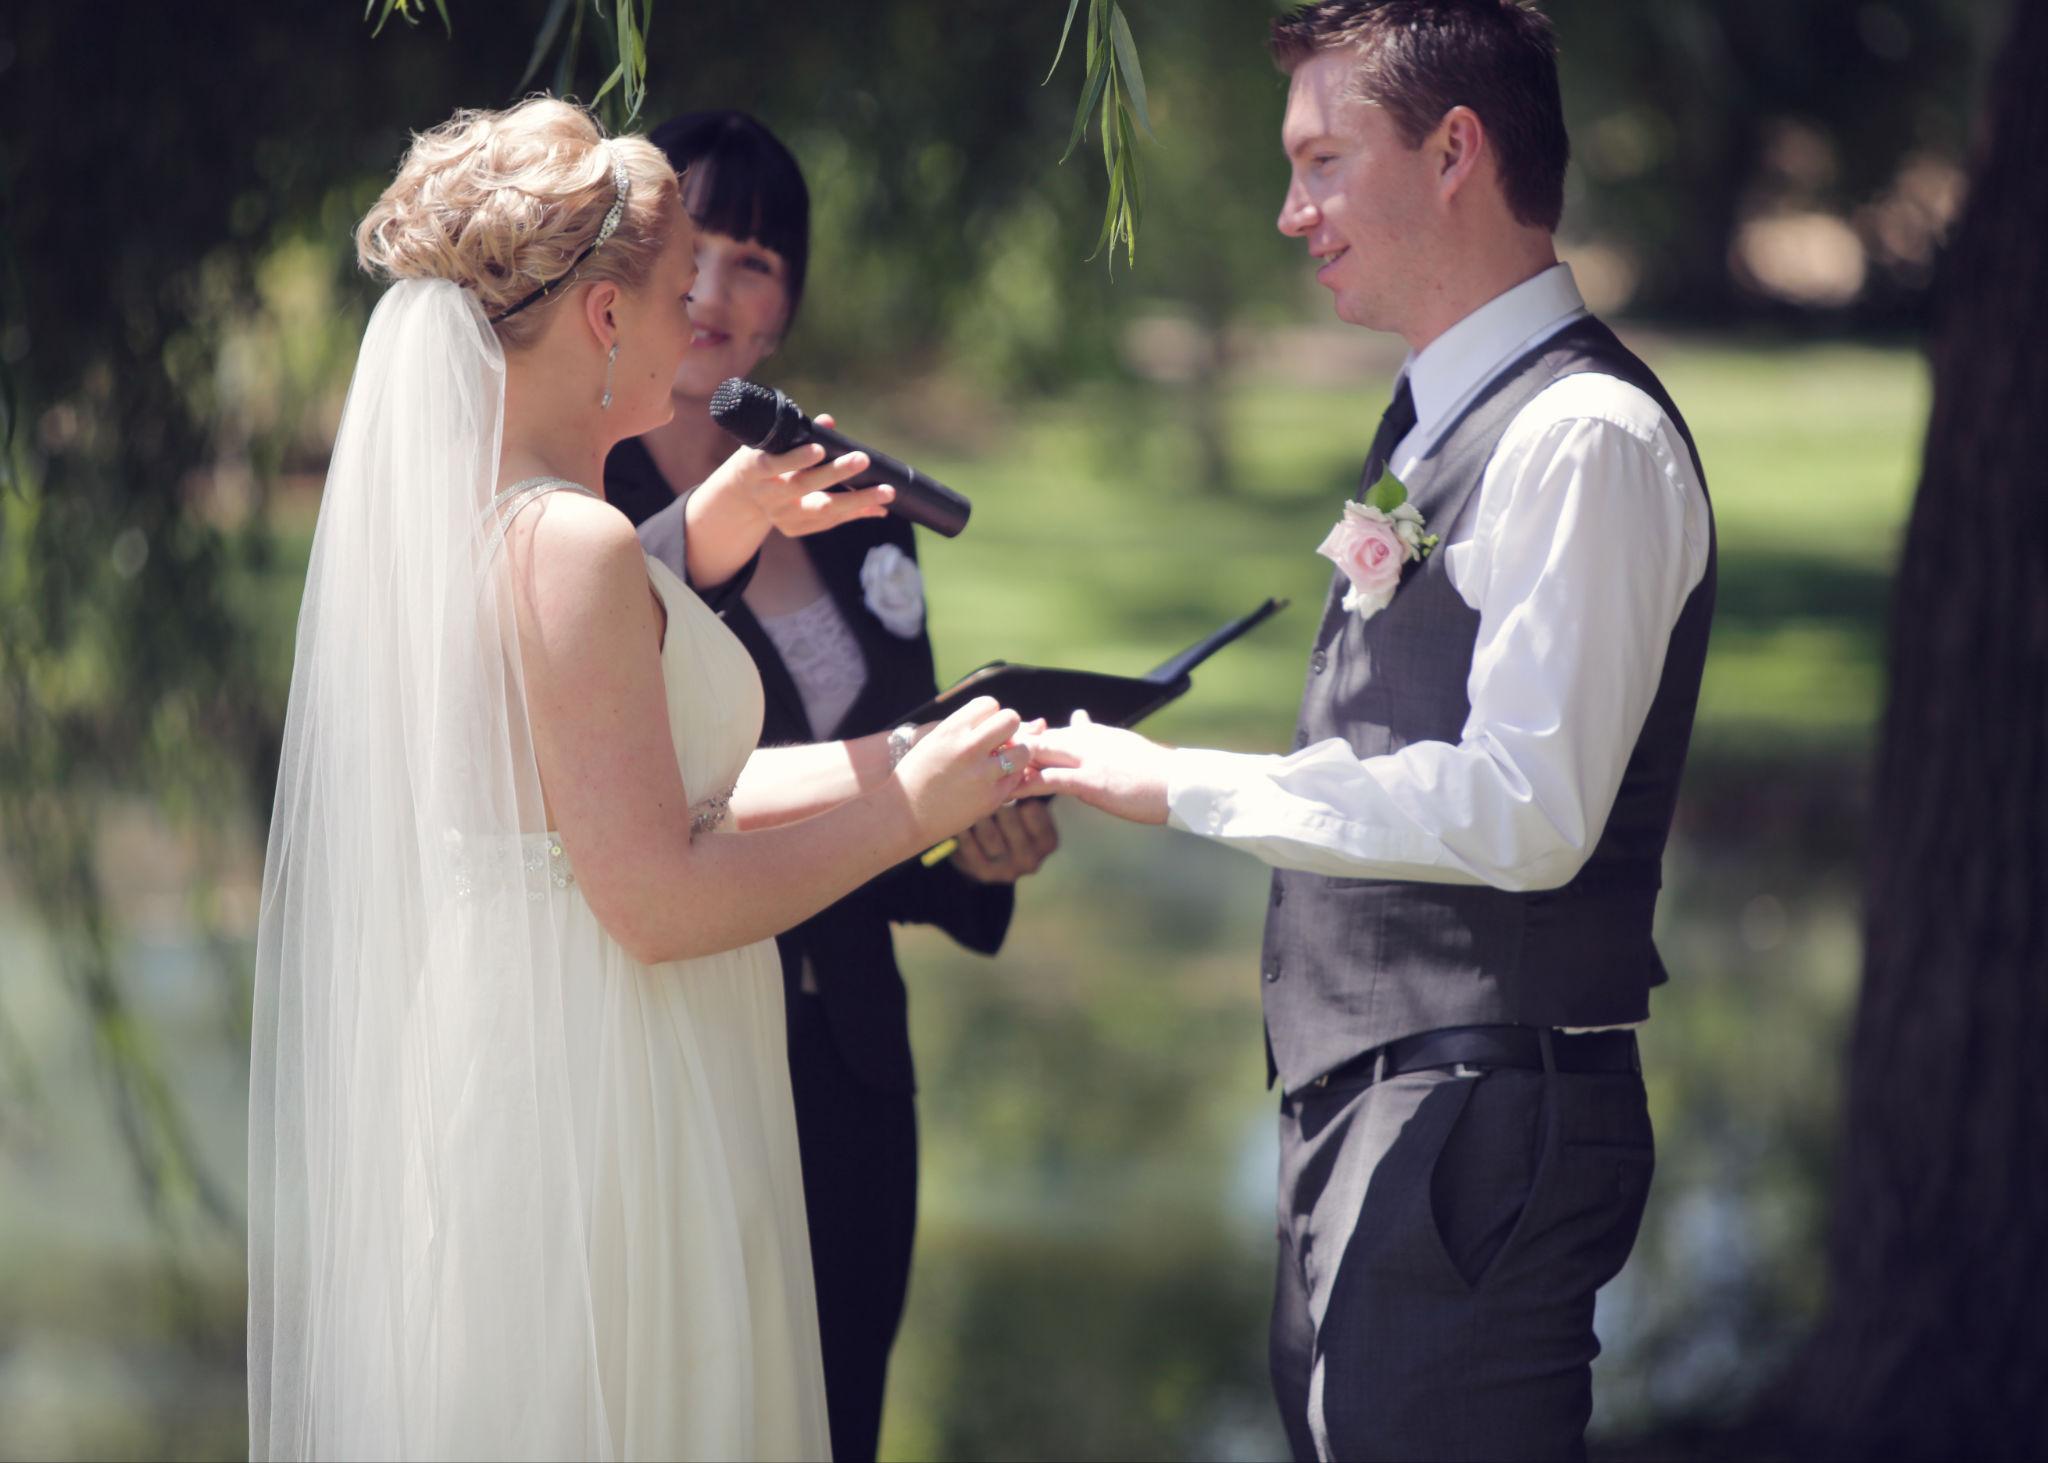 Melissa saying her ring vows to Damon